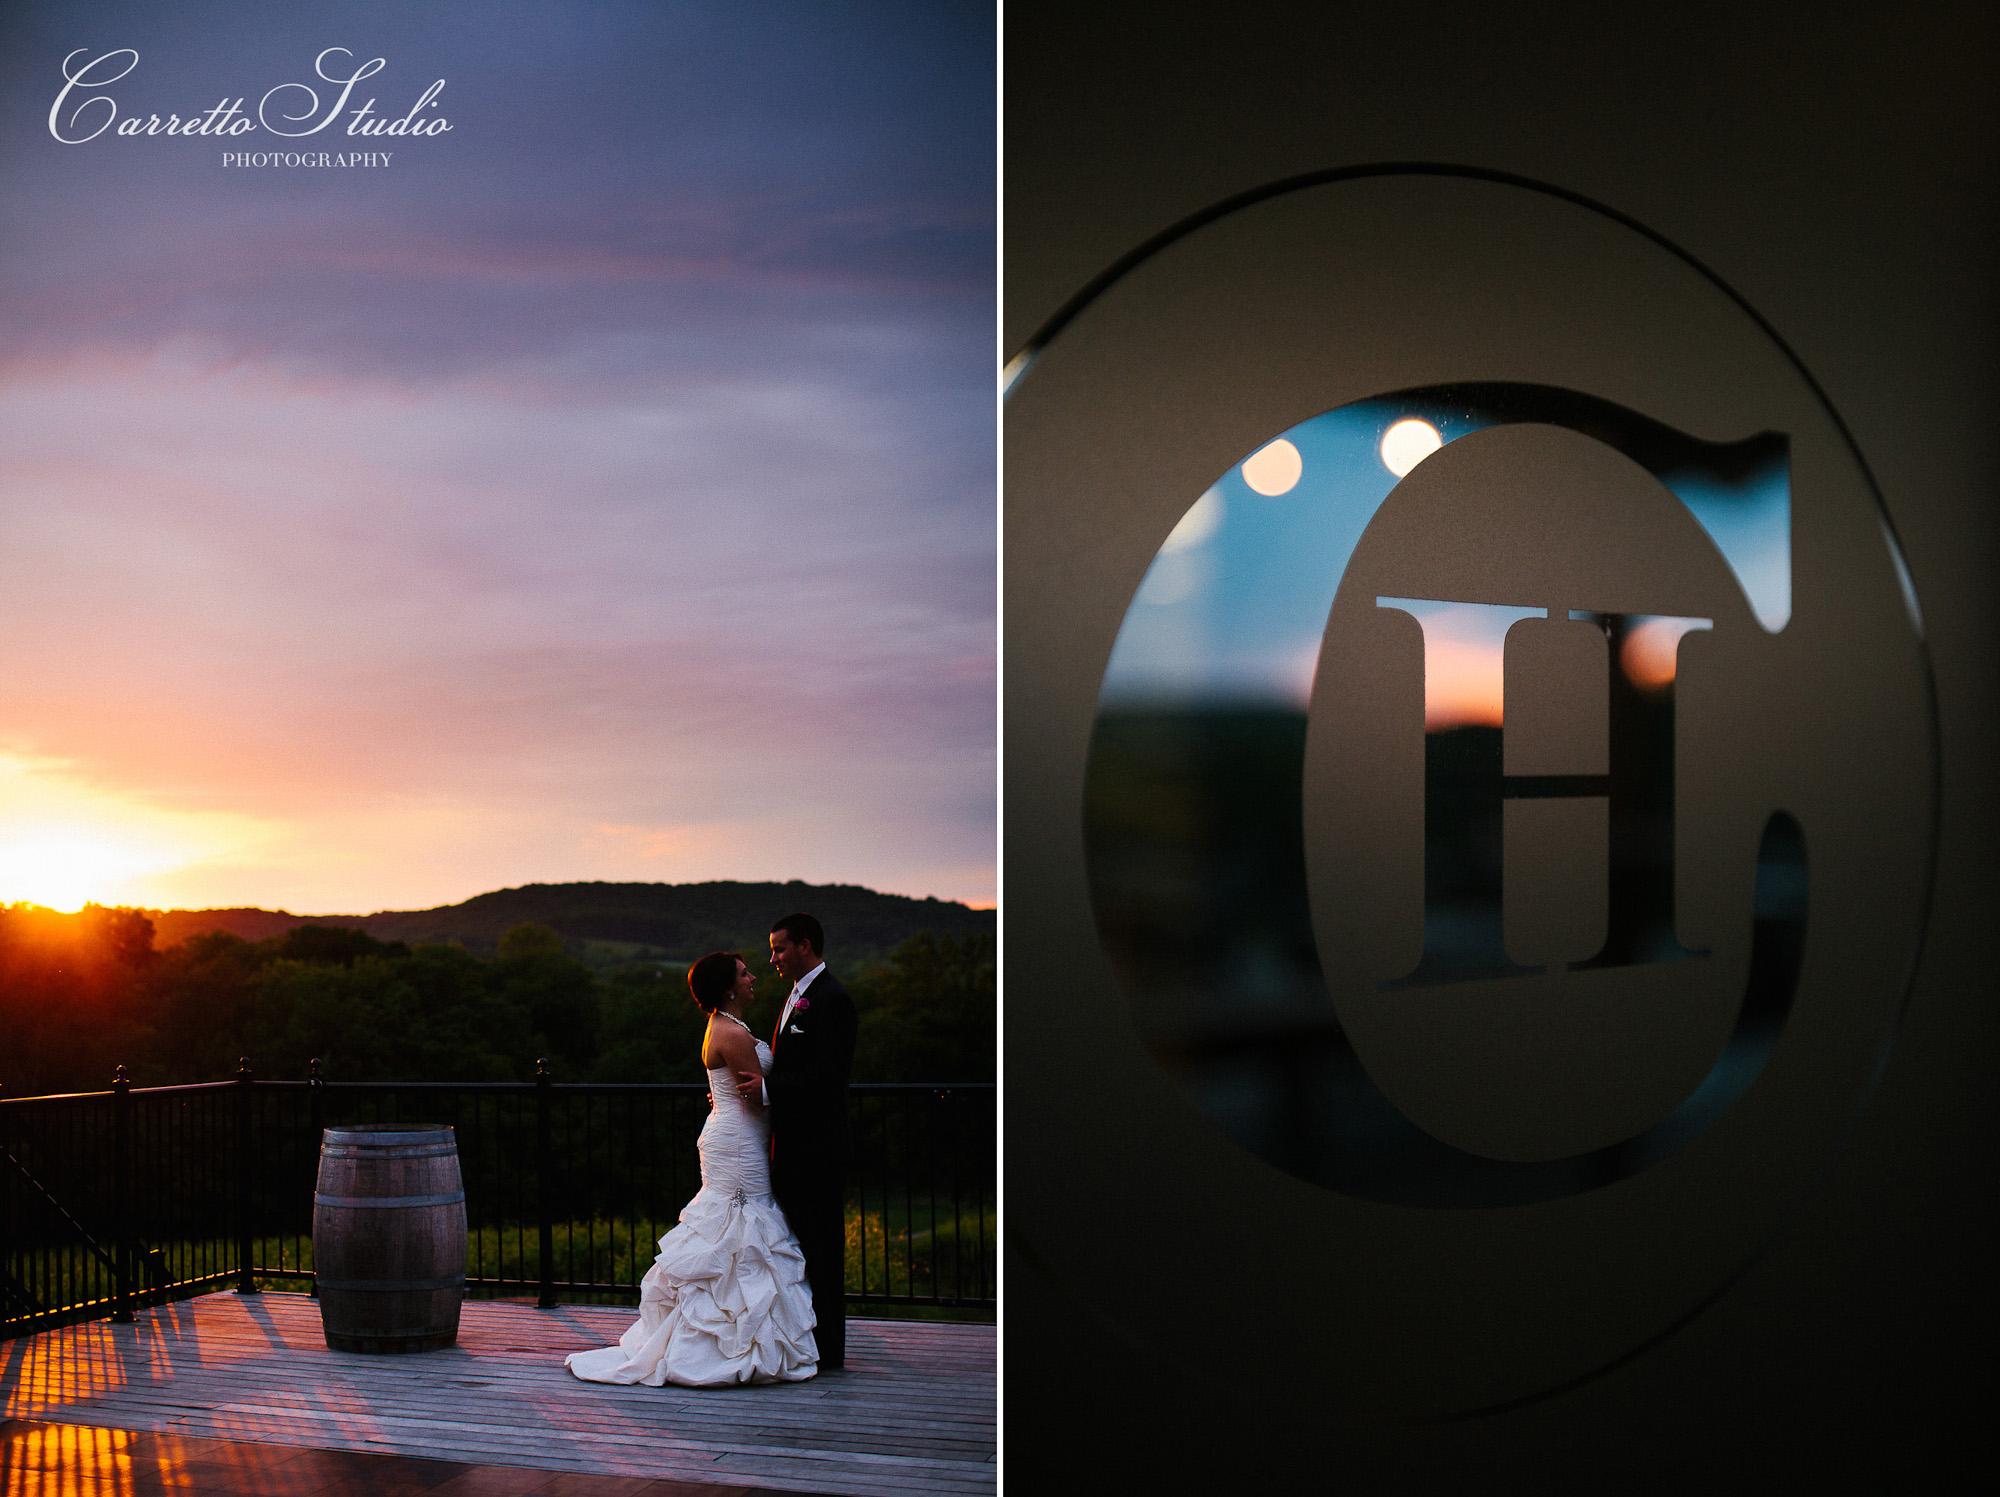 St-Louis-Wedding-Photography-1037.jpg